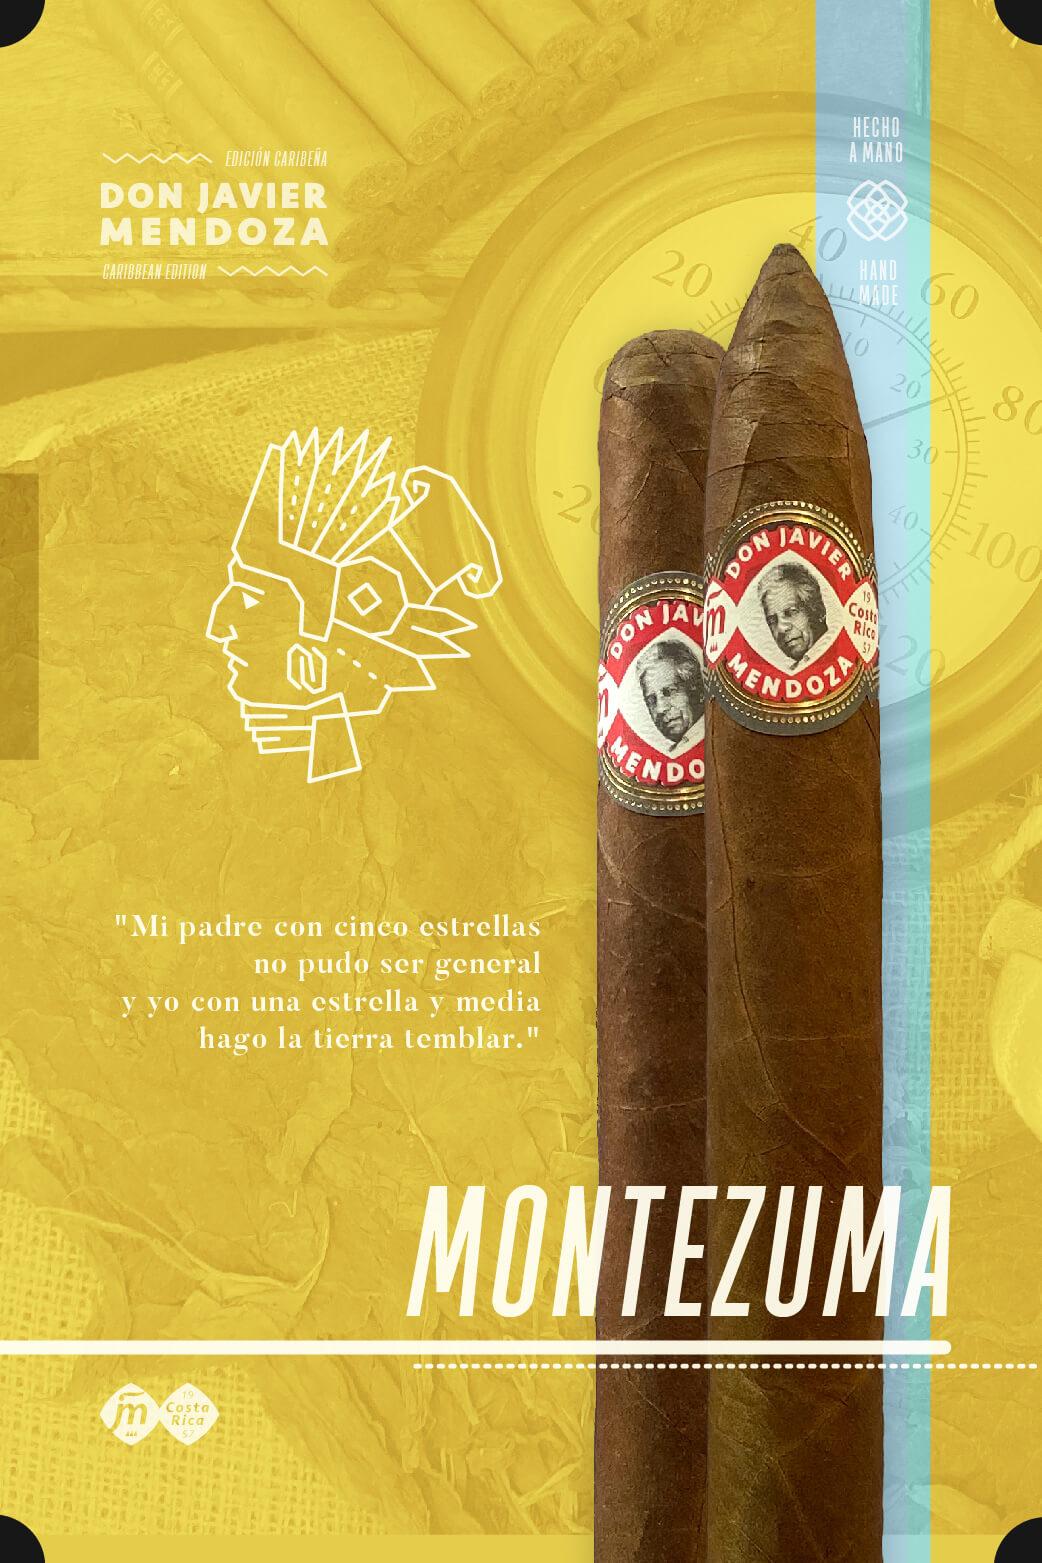 Don Javier Mendoza Montezuma